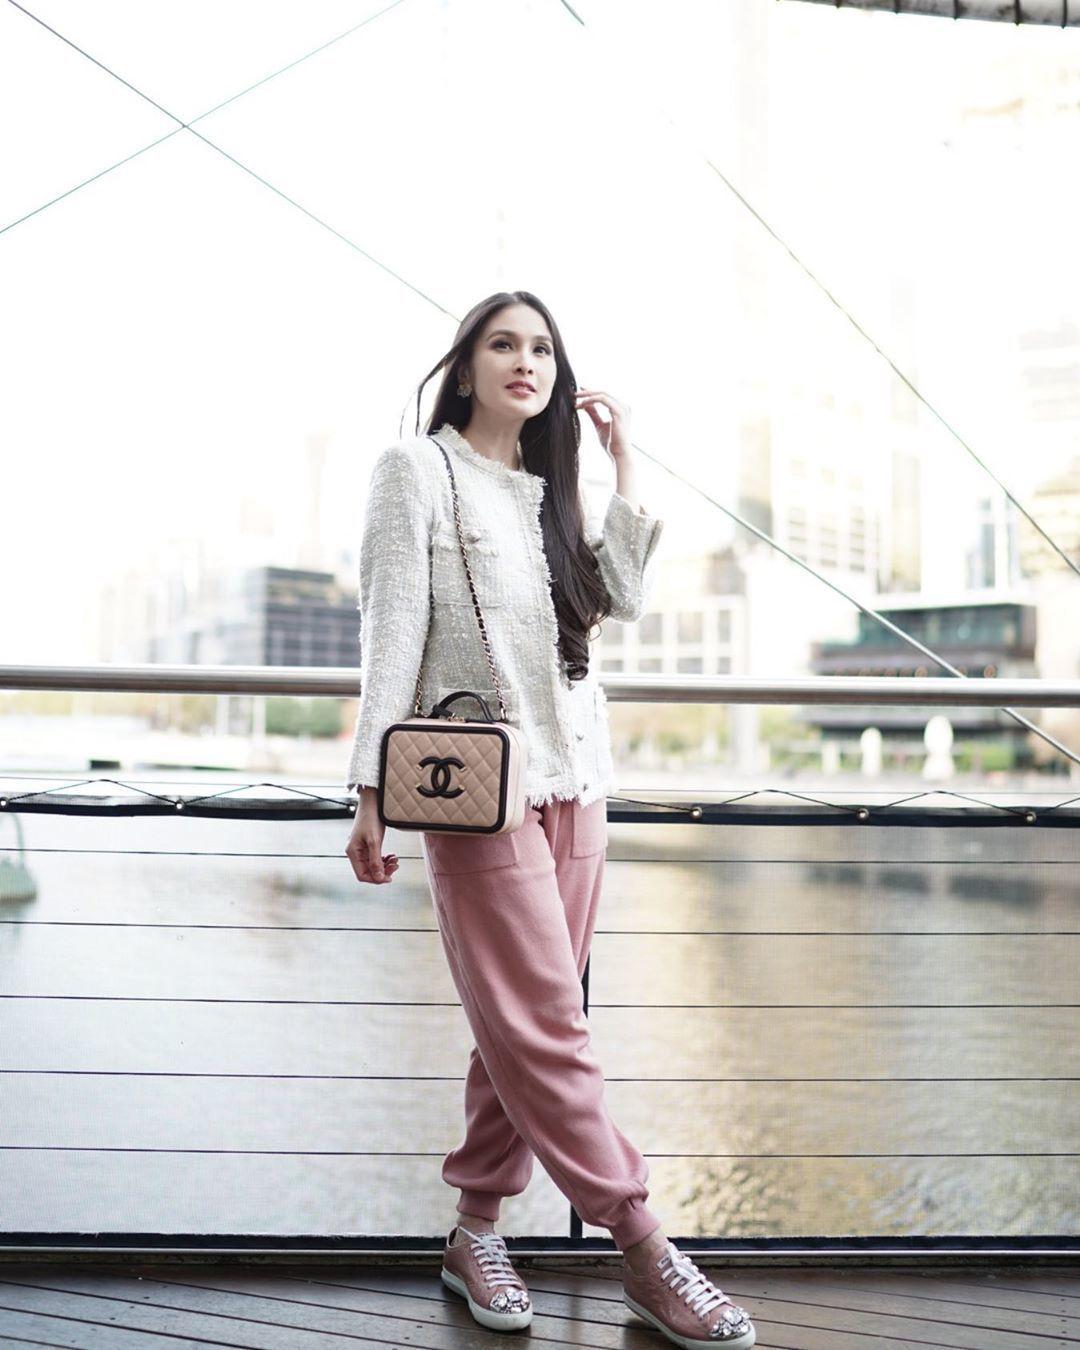 Jessica Iskandar dan 6 Seleb Lainnya dengan OOTD Terbaik di Minggu Ini